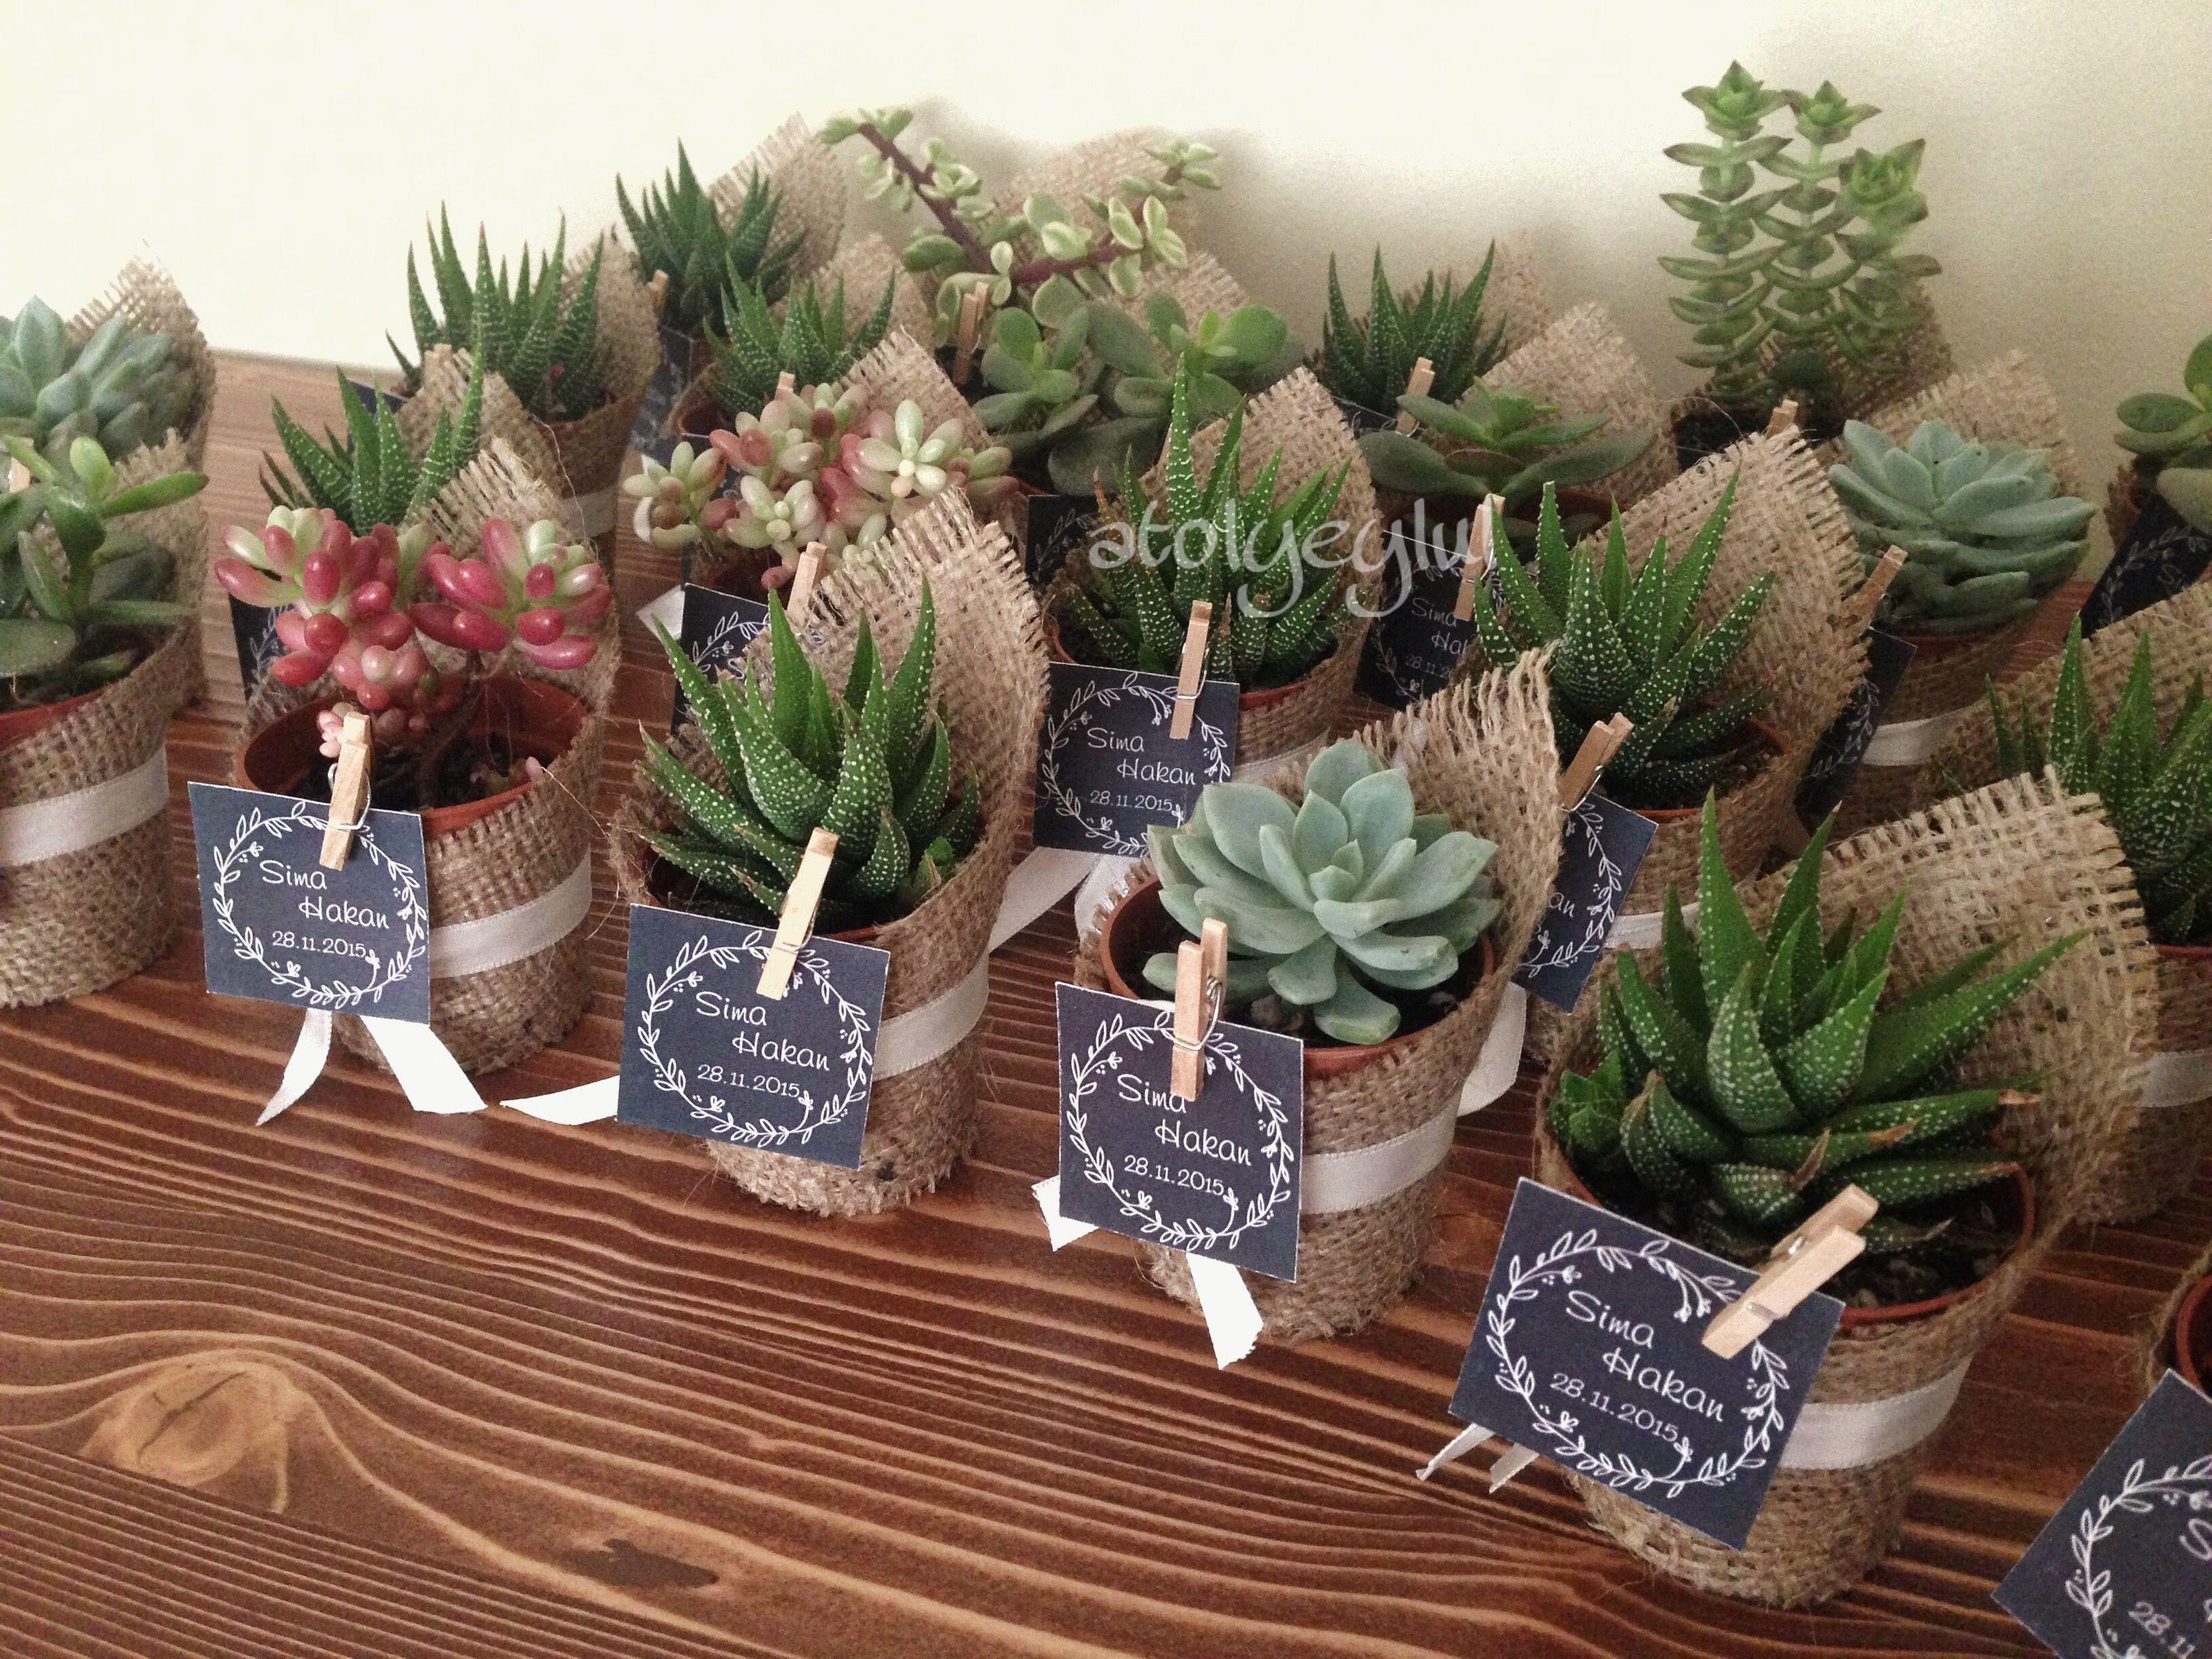 Mini Sukulent Mini Succulent Kaktus Cactus Wedding Favors Nikah Sekeri Nikah Hediyesi Babyshower By Atolyeylu Sukulent Nikah Sekerleri Dugun Sekerleri